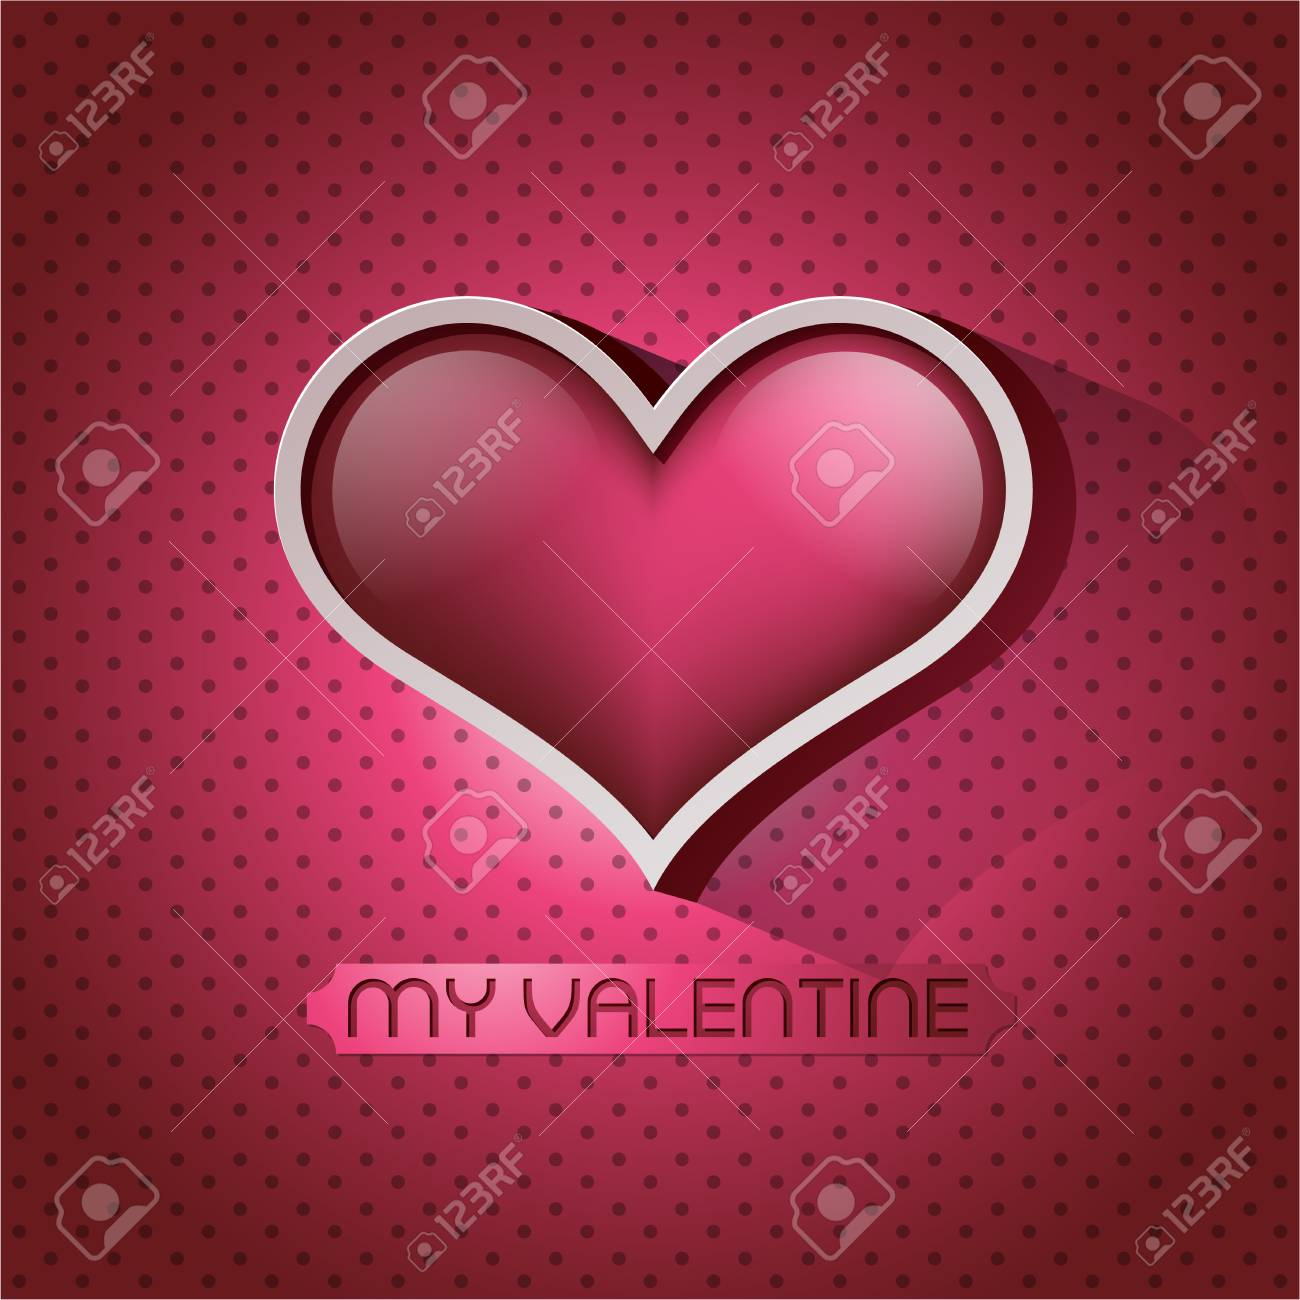 Glossy heart valentin's day card eps 10 Stock Vector - 24060735